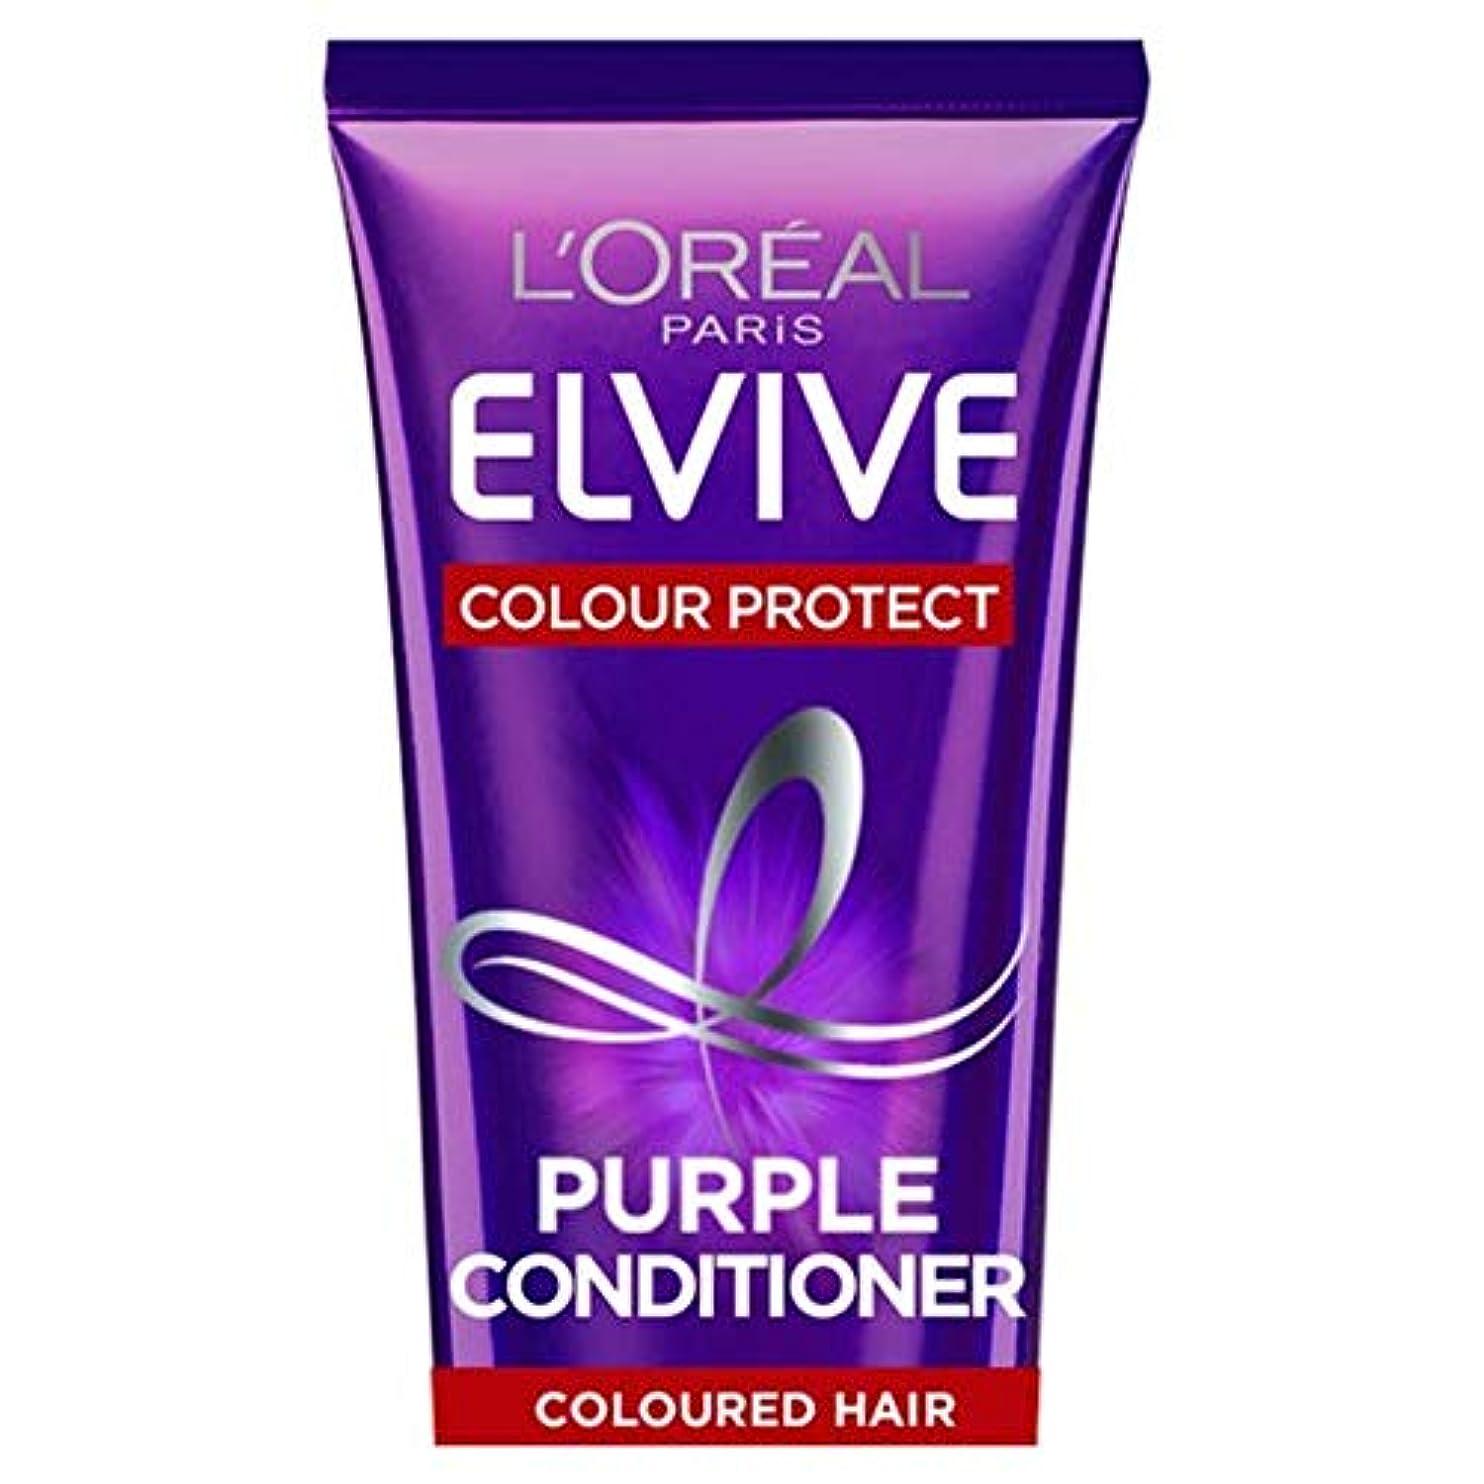 [Elvive] ロレアルElvive色は紫コンディショナー150ミリリットルを保護します - L'oreal Elvive Colour Protect Purple Conditioner 150Ml [並行輸入品]